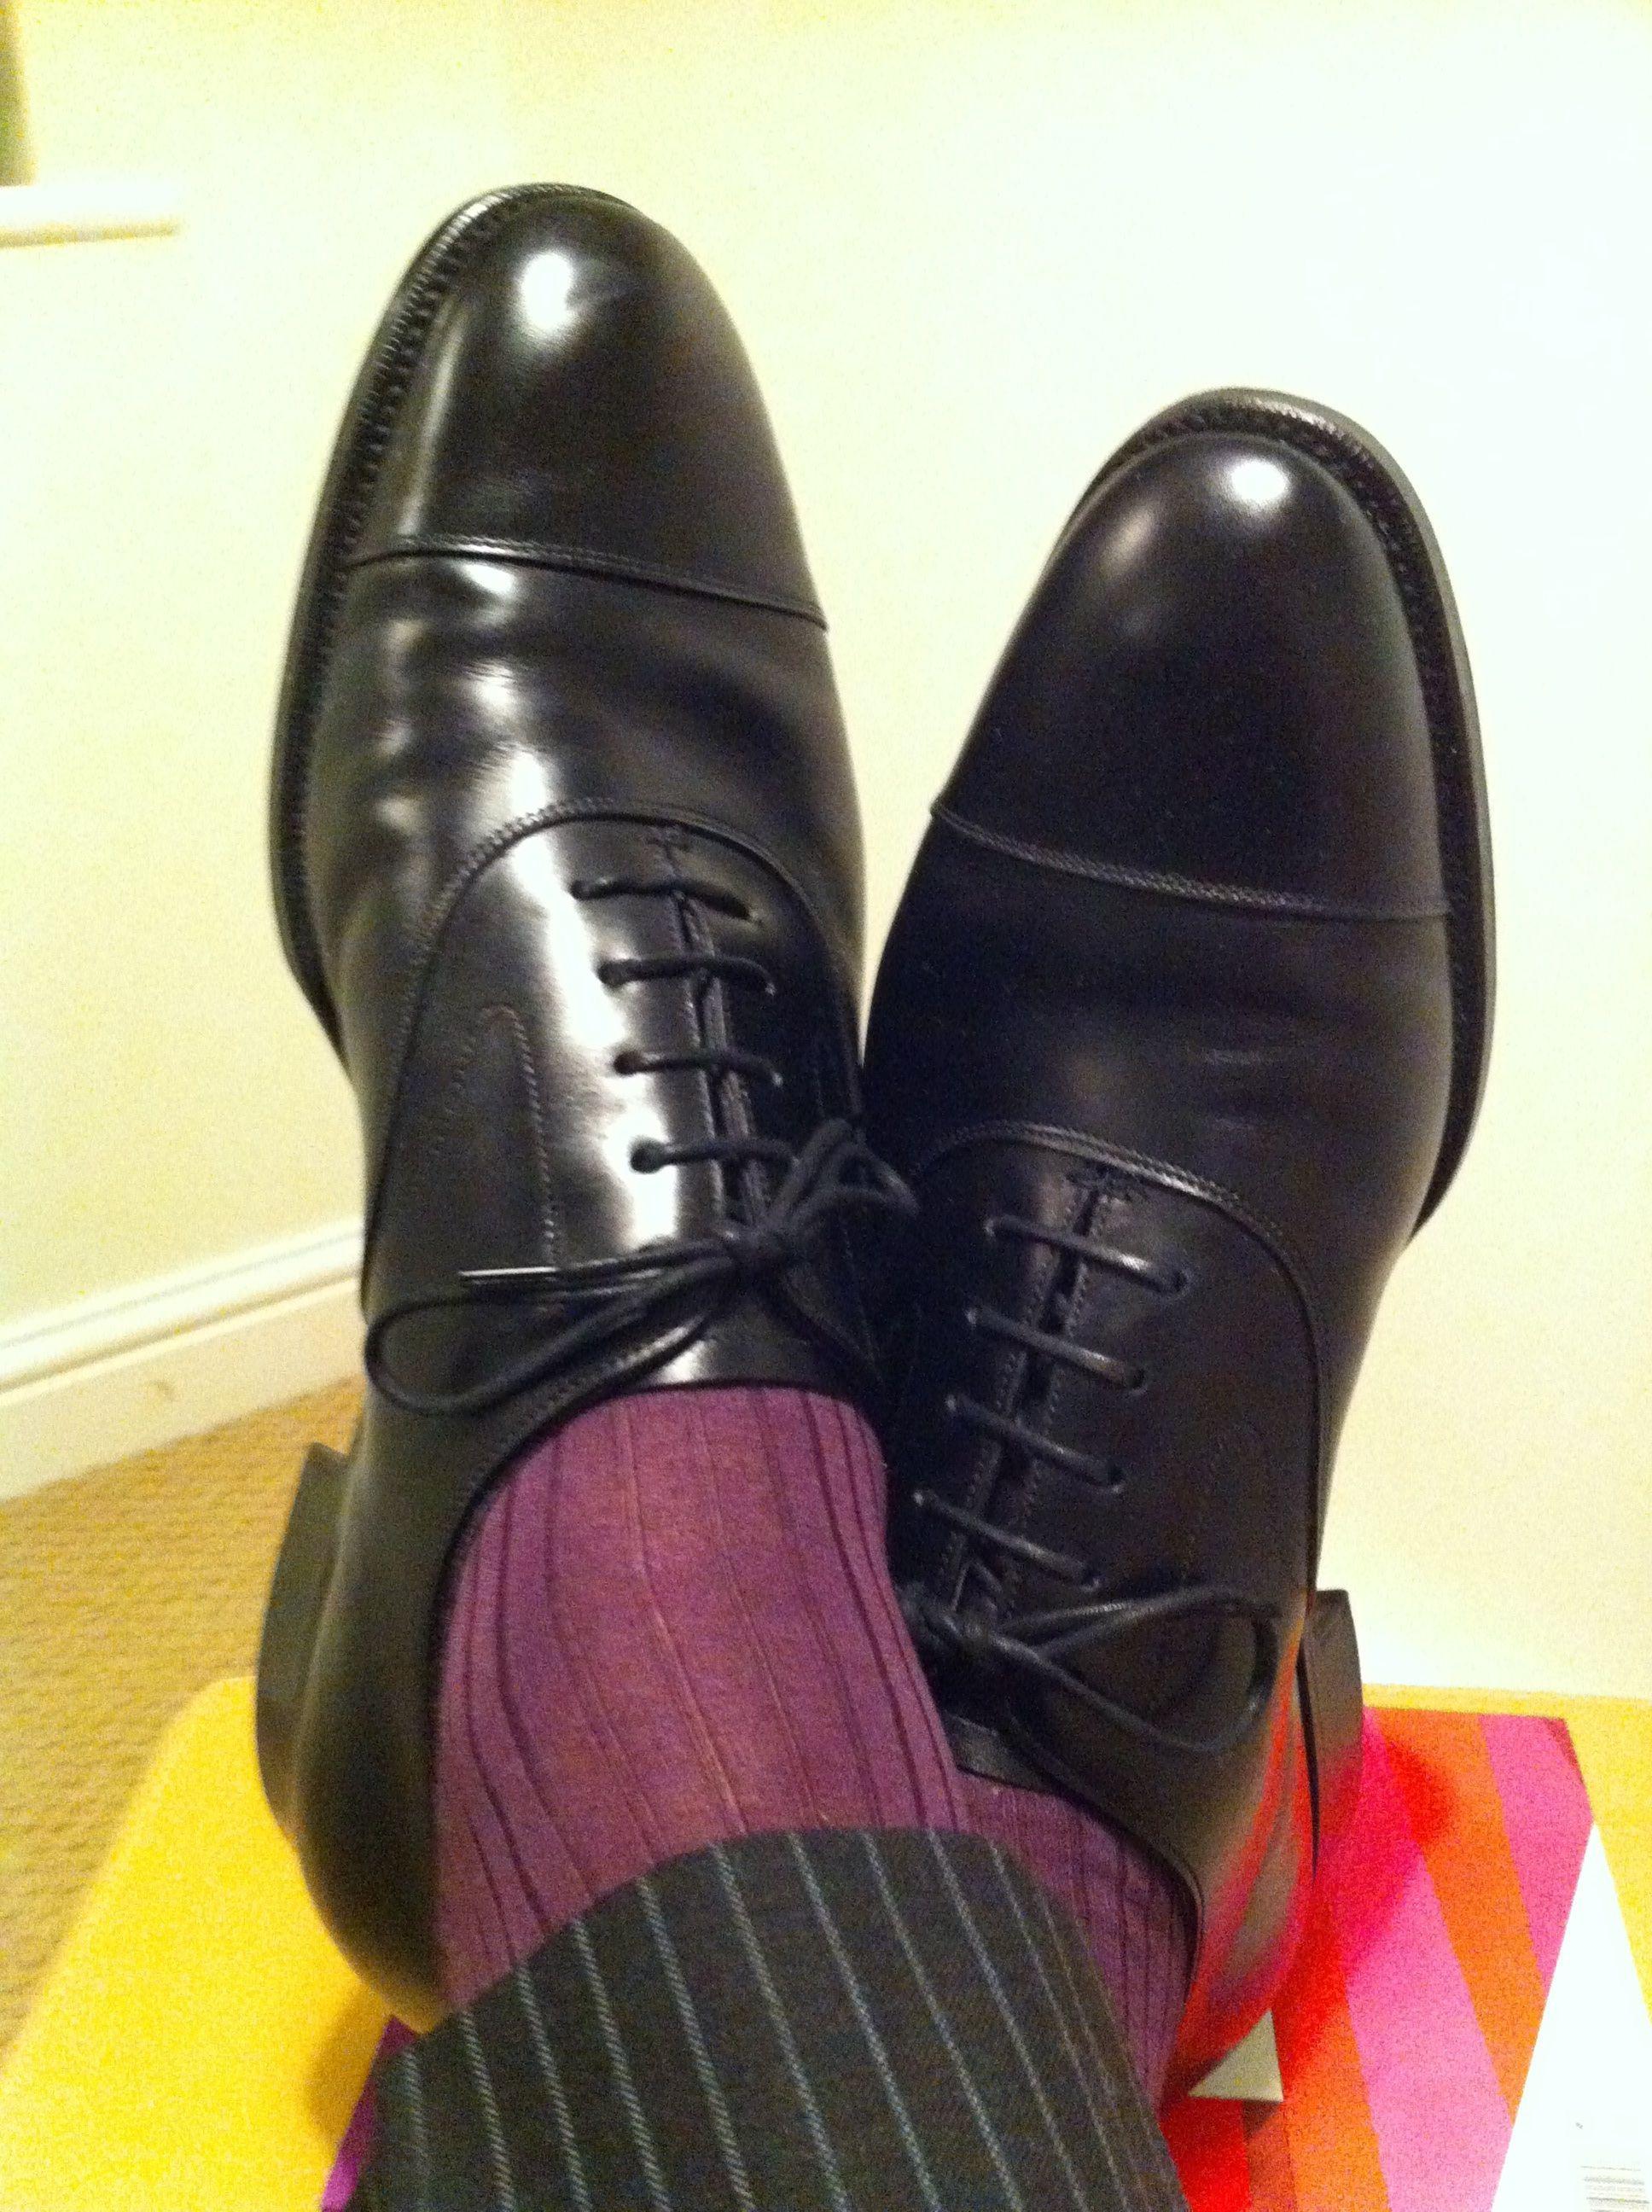 mes chaussettes rouges contest socks pant and shoe combos styleforum. Black Bedroom Furniture Sets. Home Design Ideas